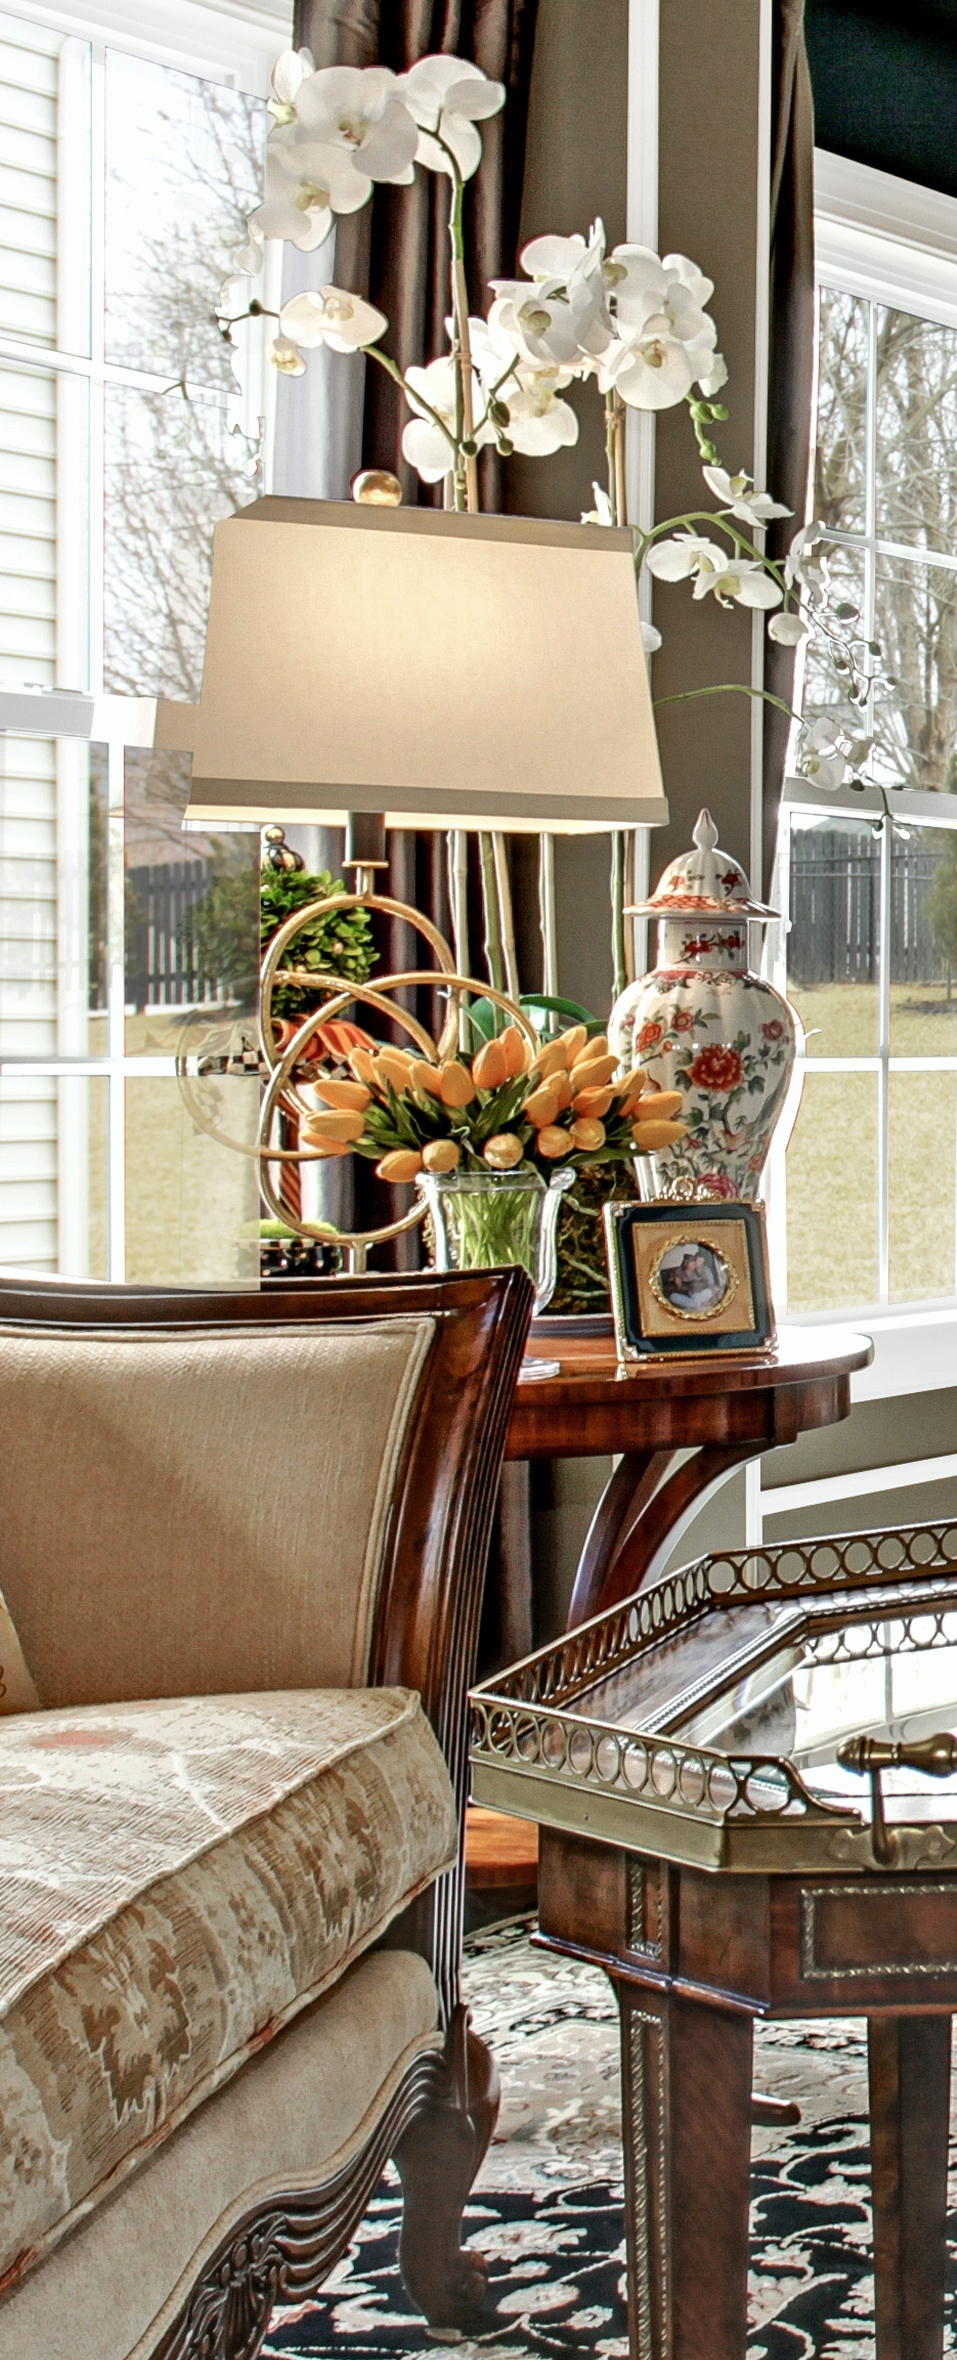 Certified Interior Decorator Professional Organizer Ltb Designs